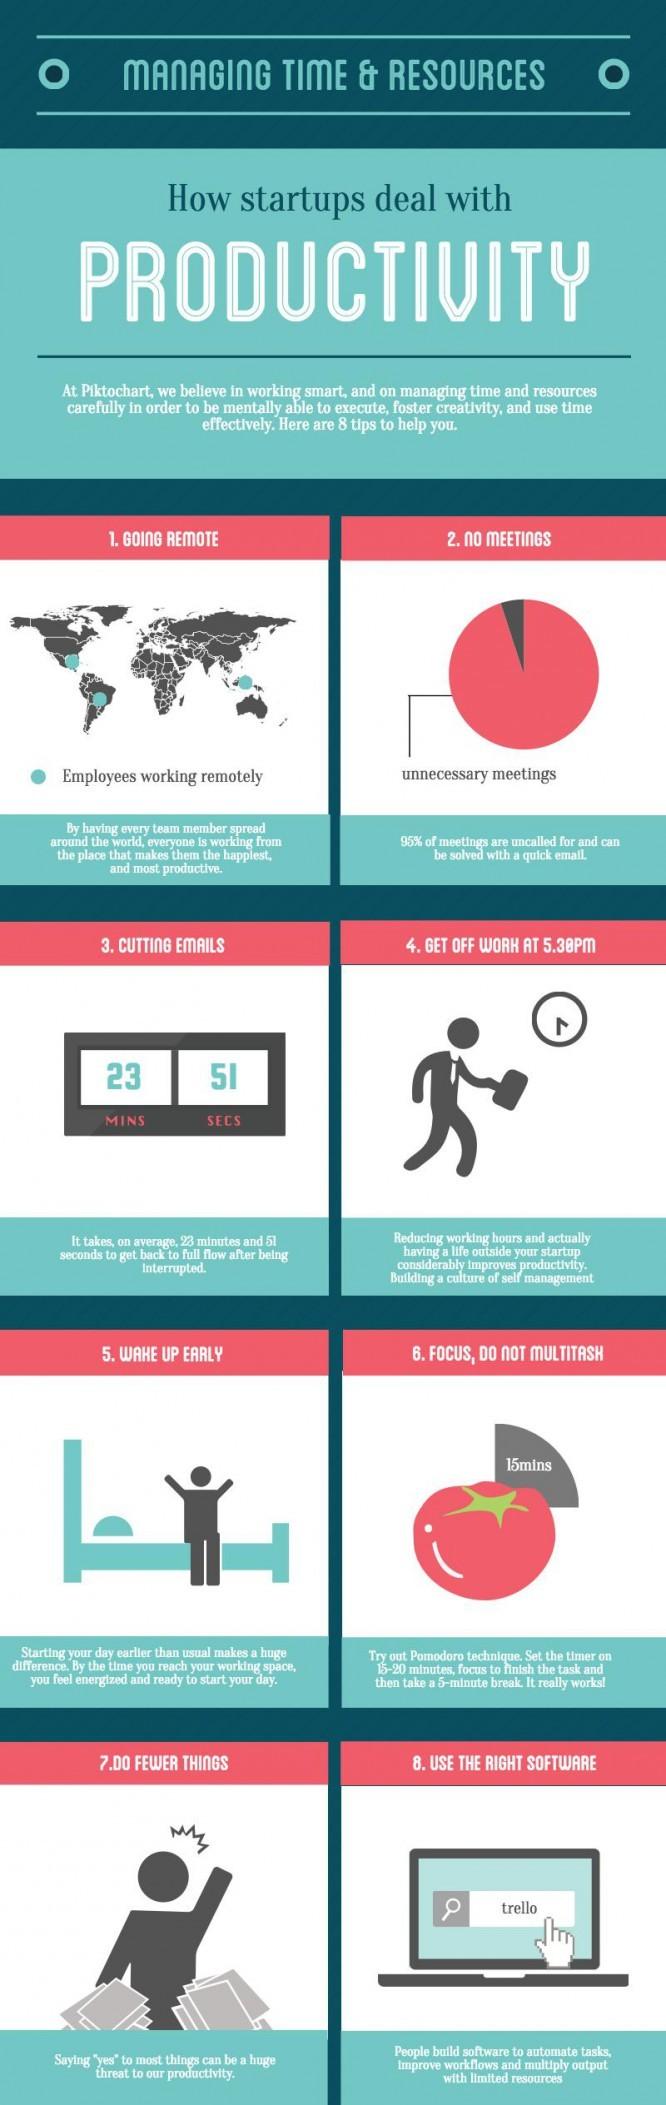 Ris.-8.itogovaya-infografika